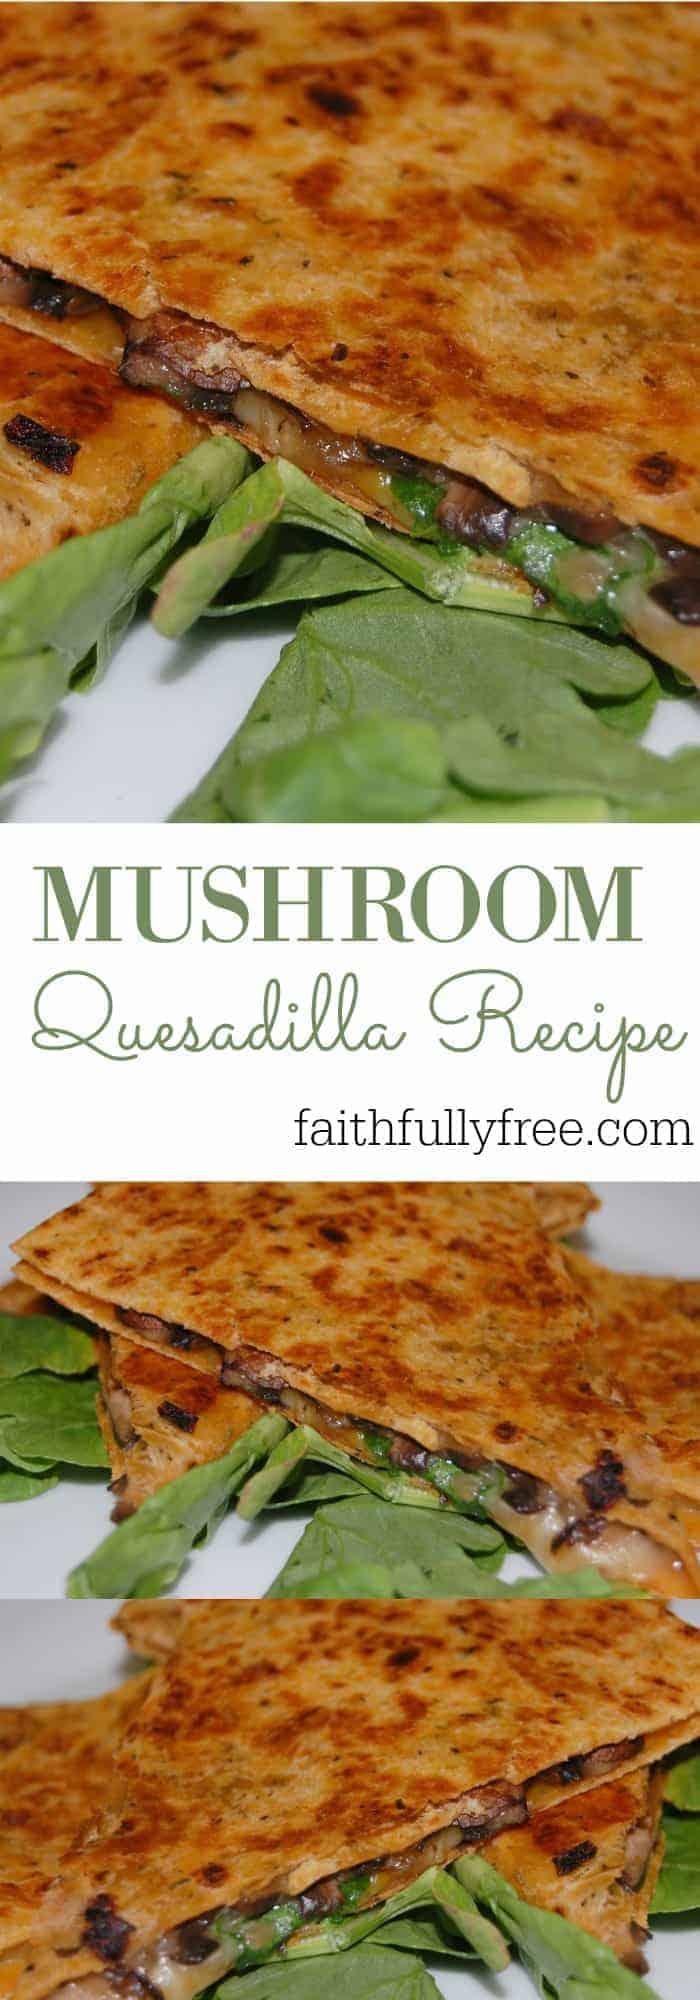 Mushroom Quesadilla Recipe | Faithfully Free